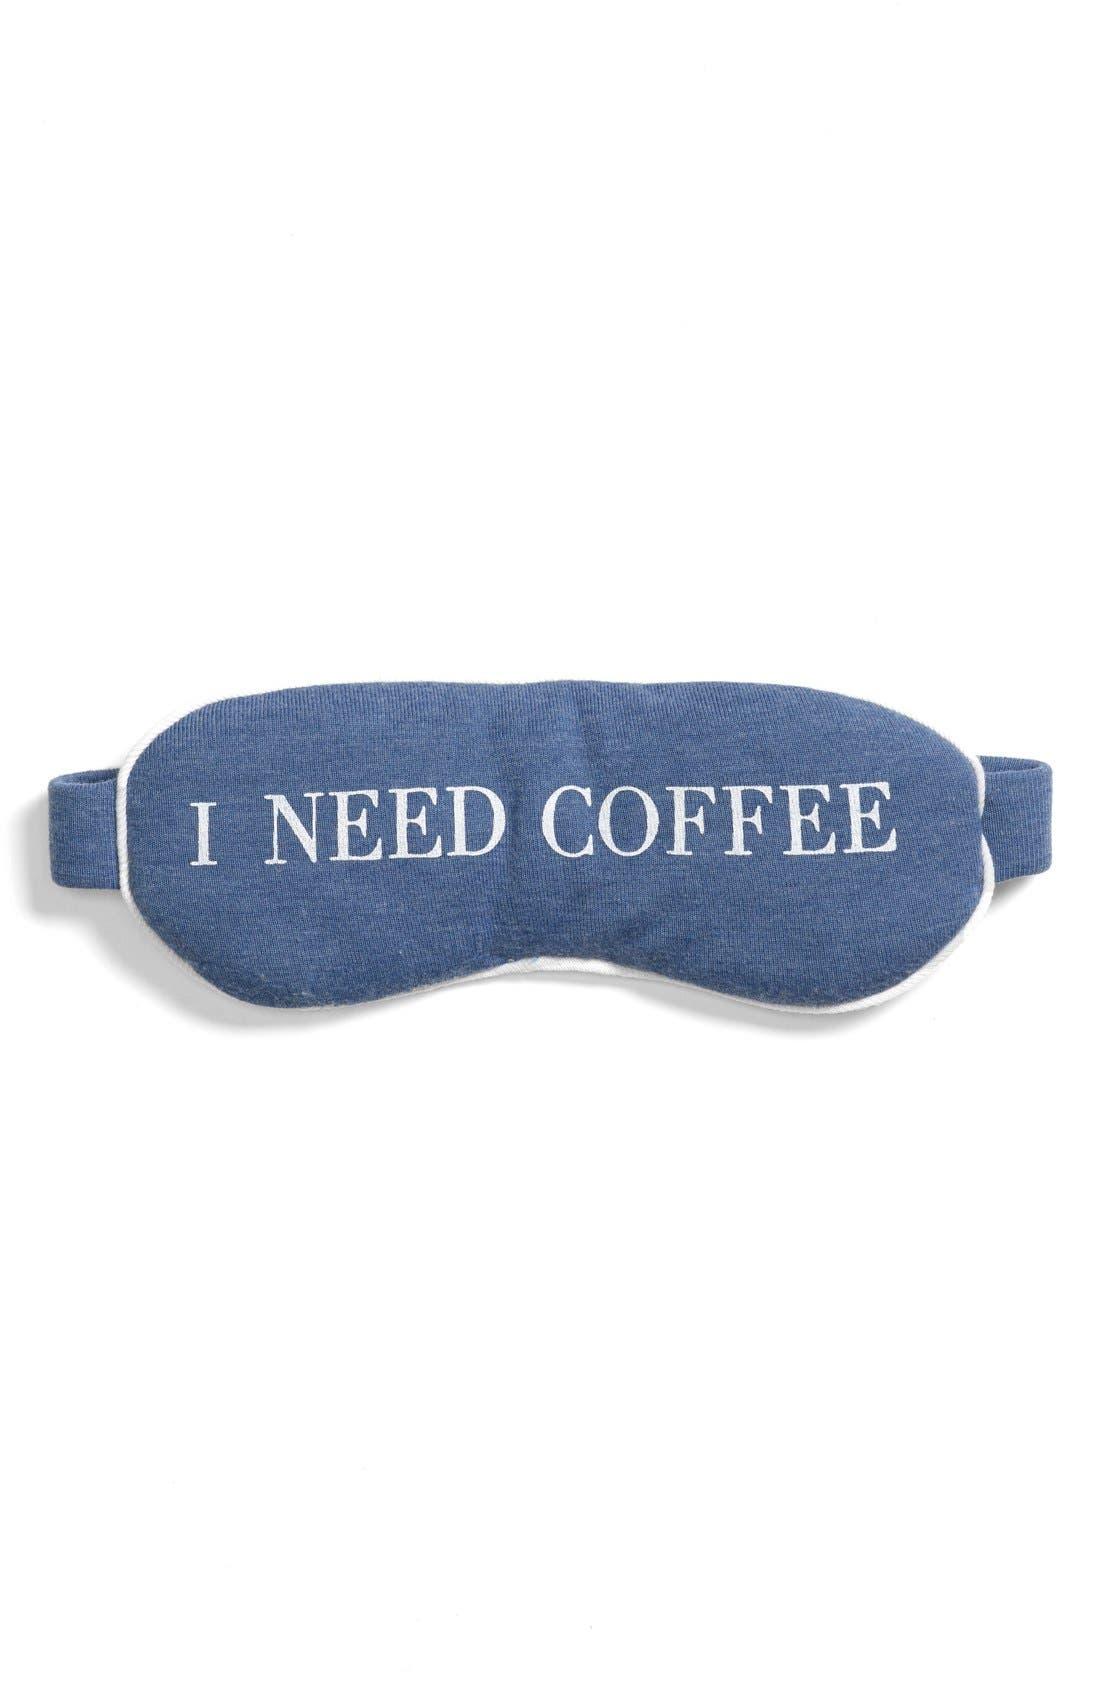 'I Need Coffee' Sleep Mask,                             Main thumbnail 1, color,                             400